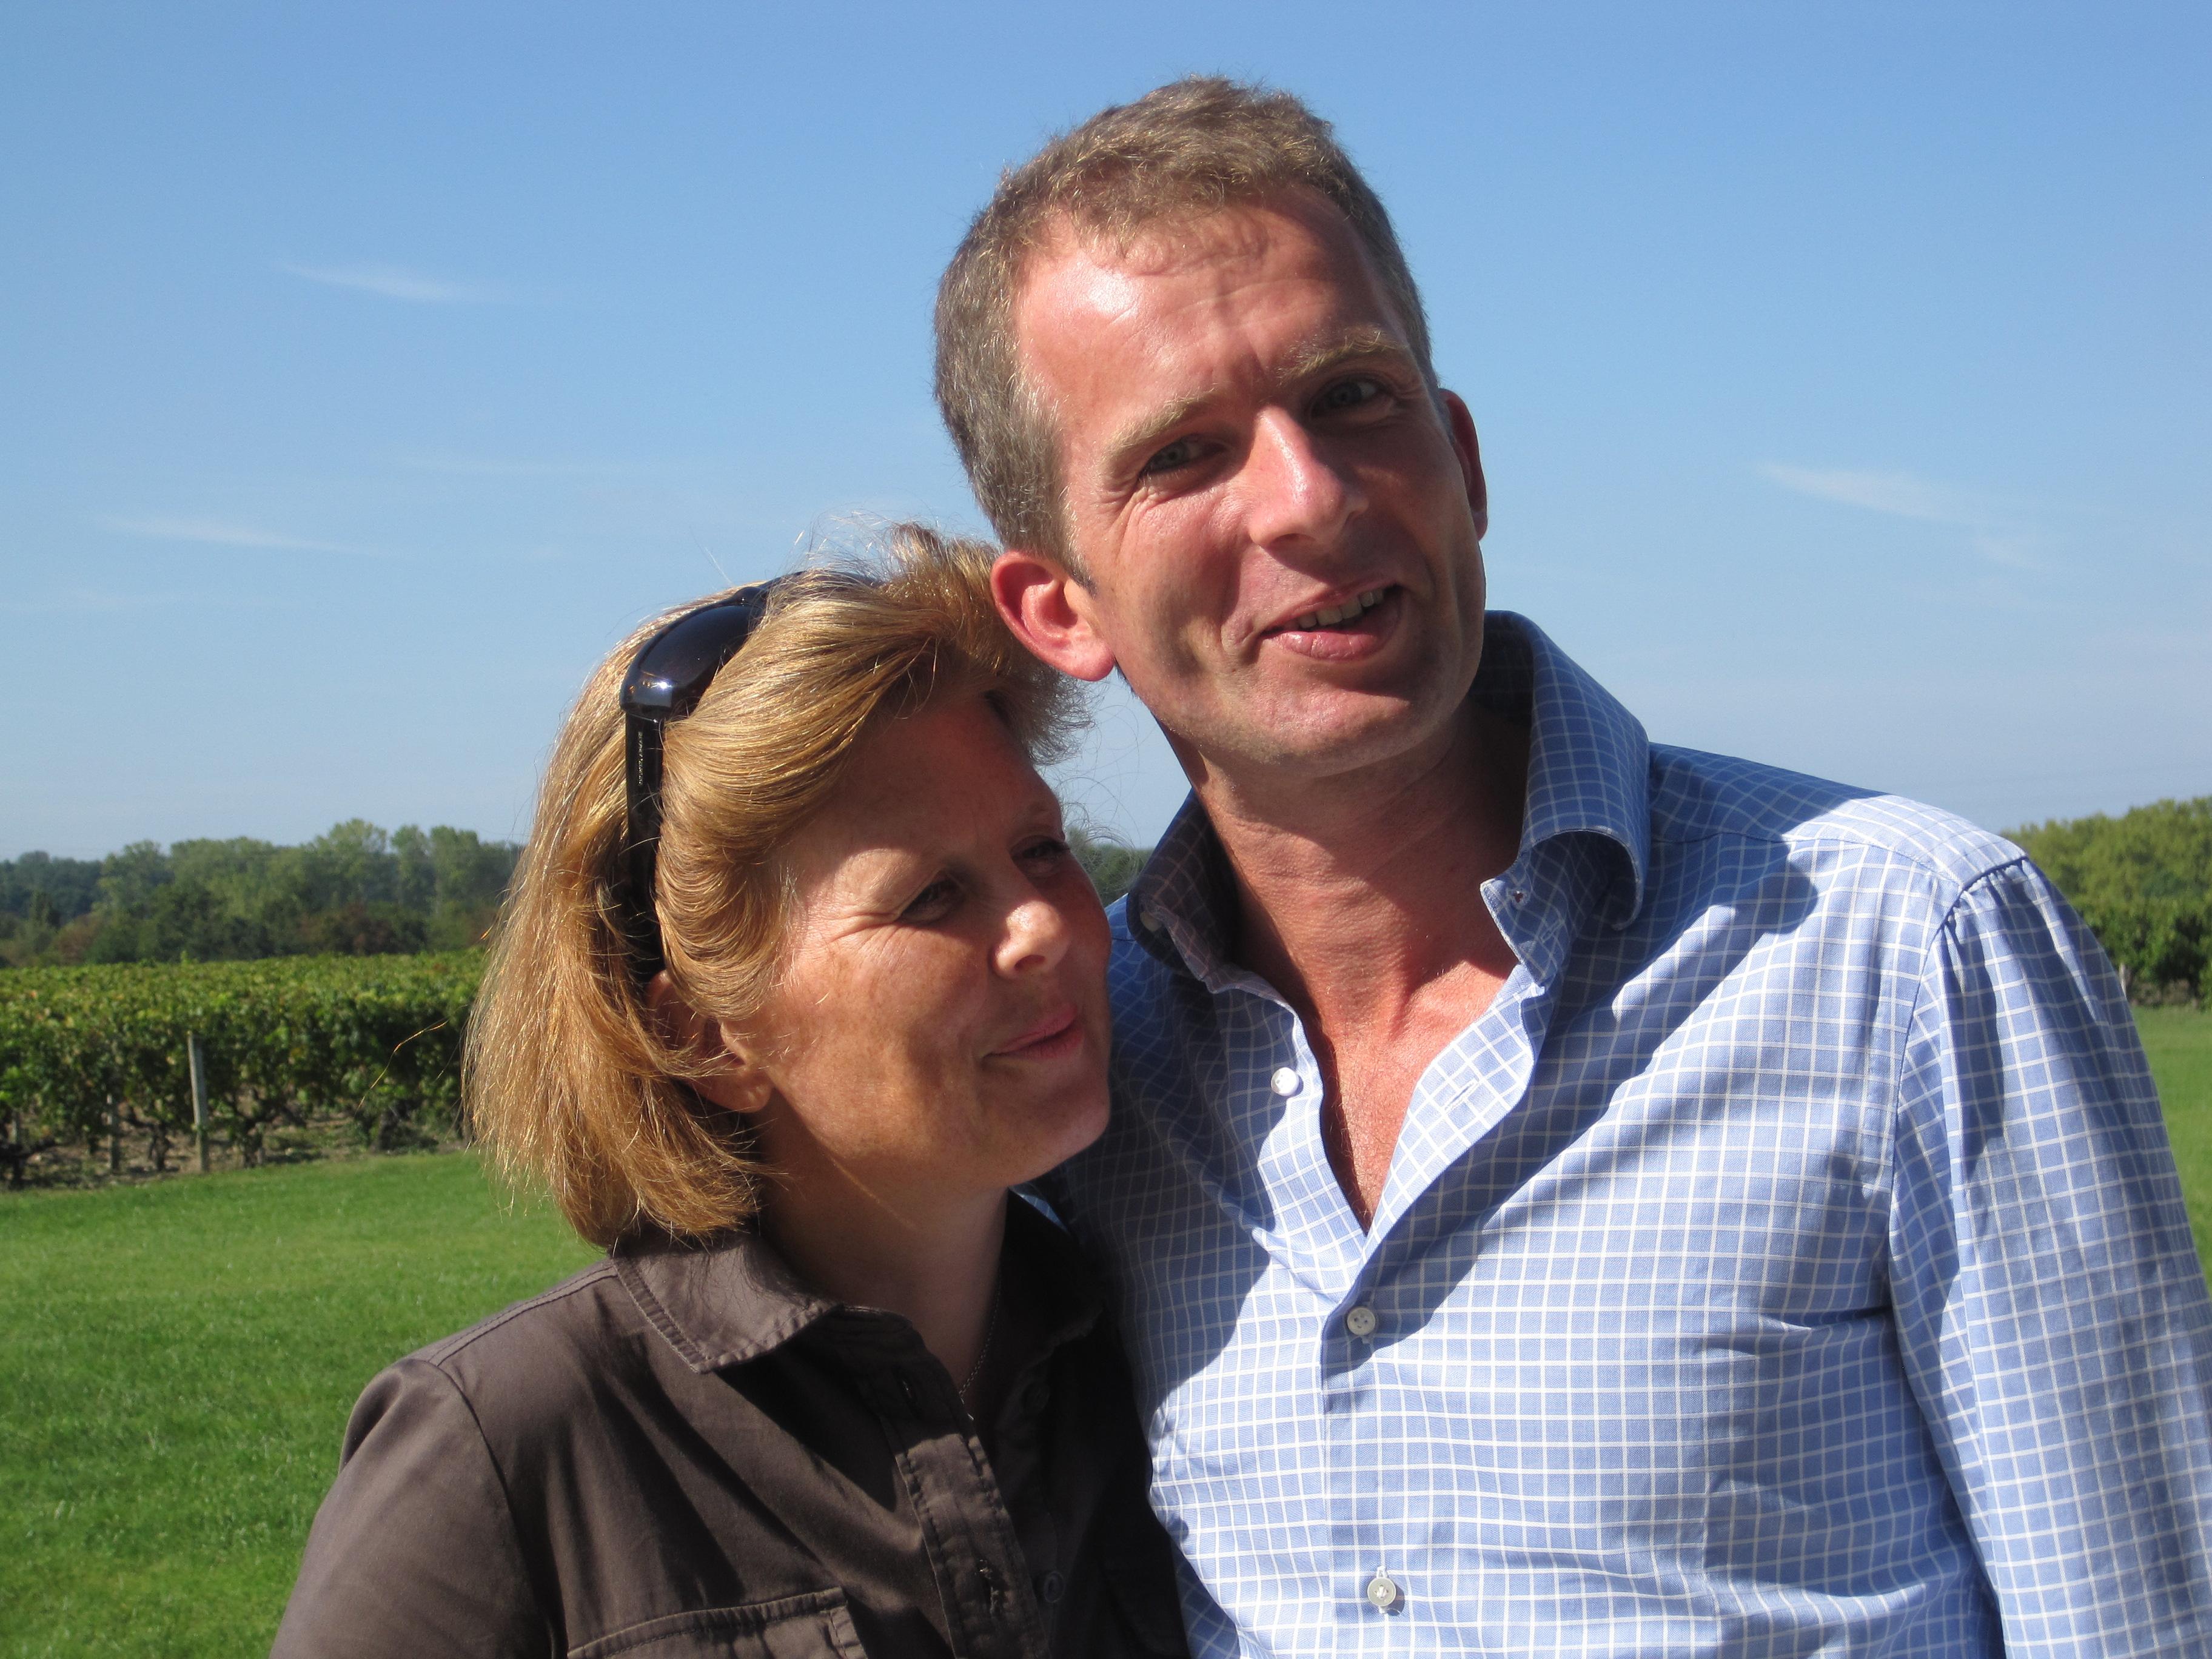 Bordeaux wine causes a Grave Situation in Pessac Leognan